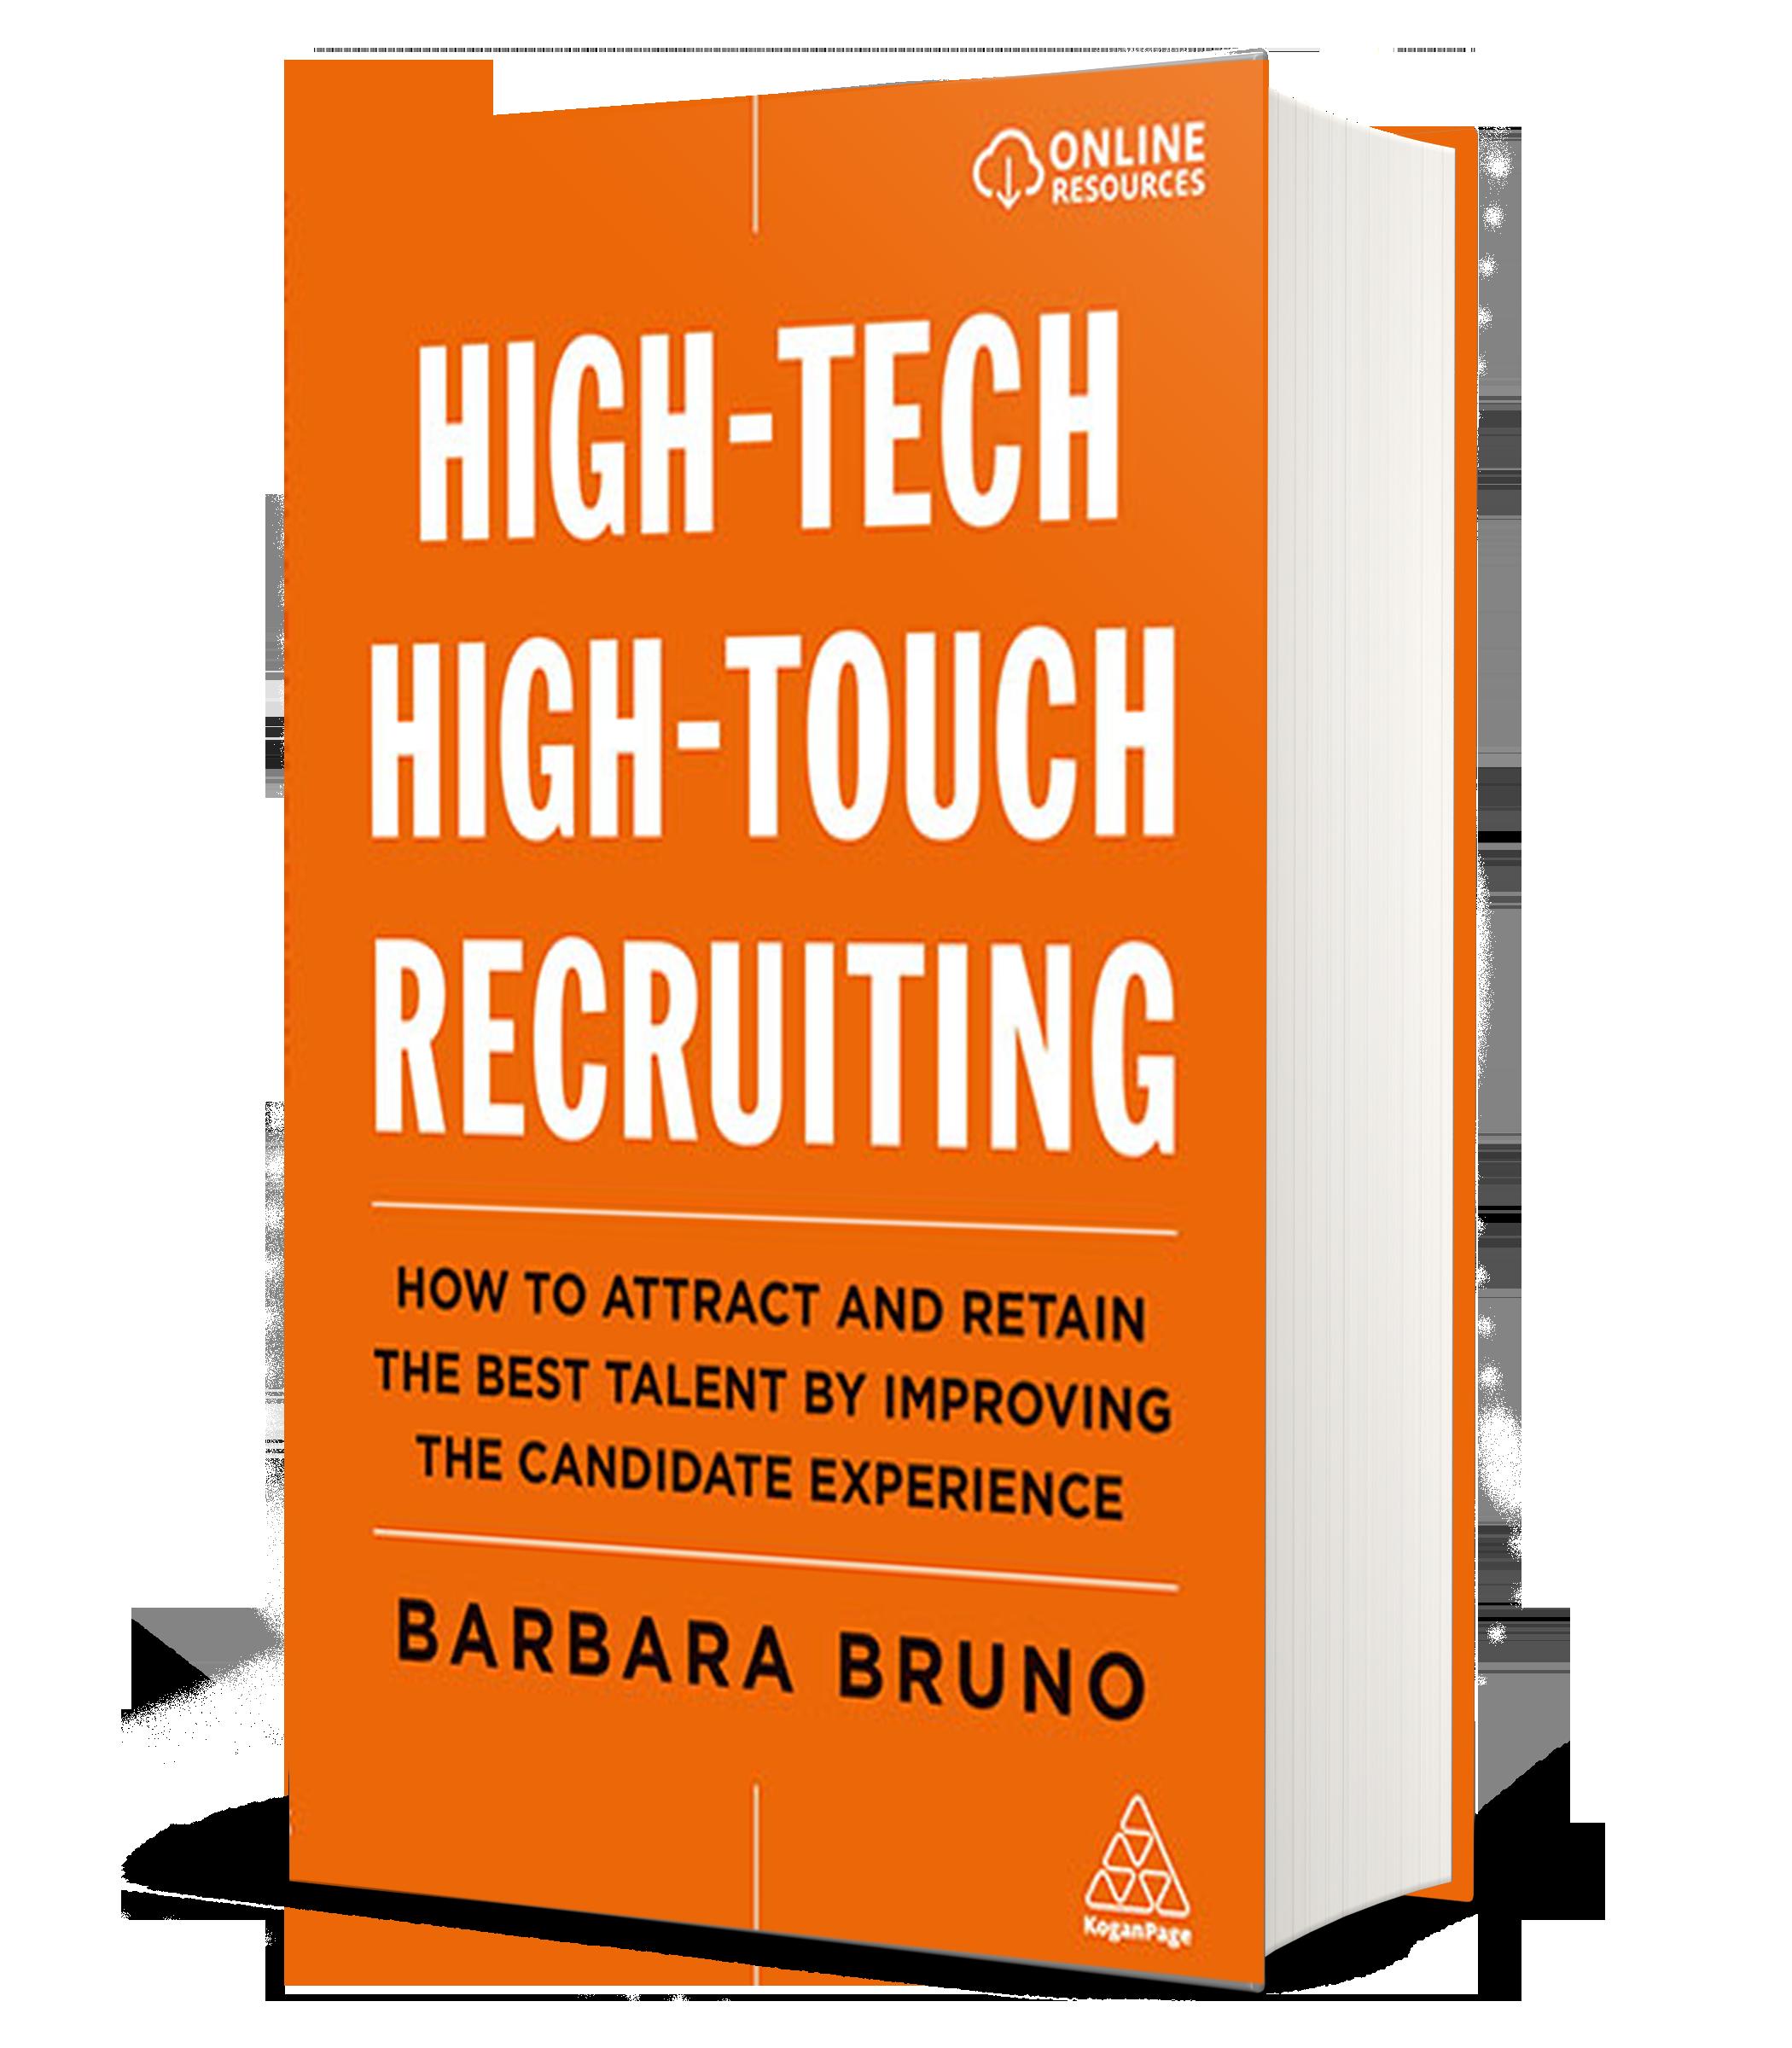 hi-tech-book